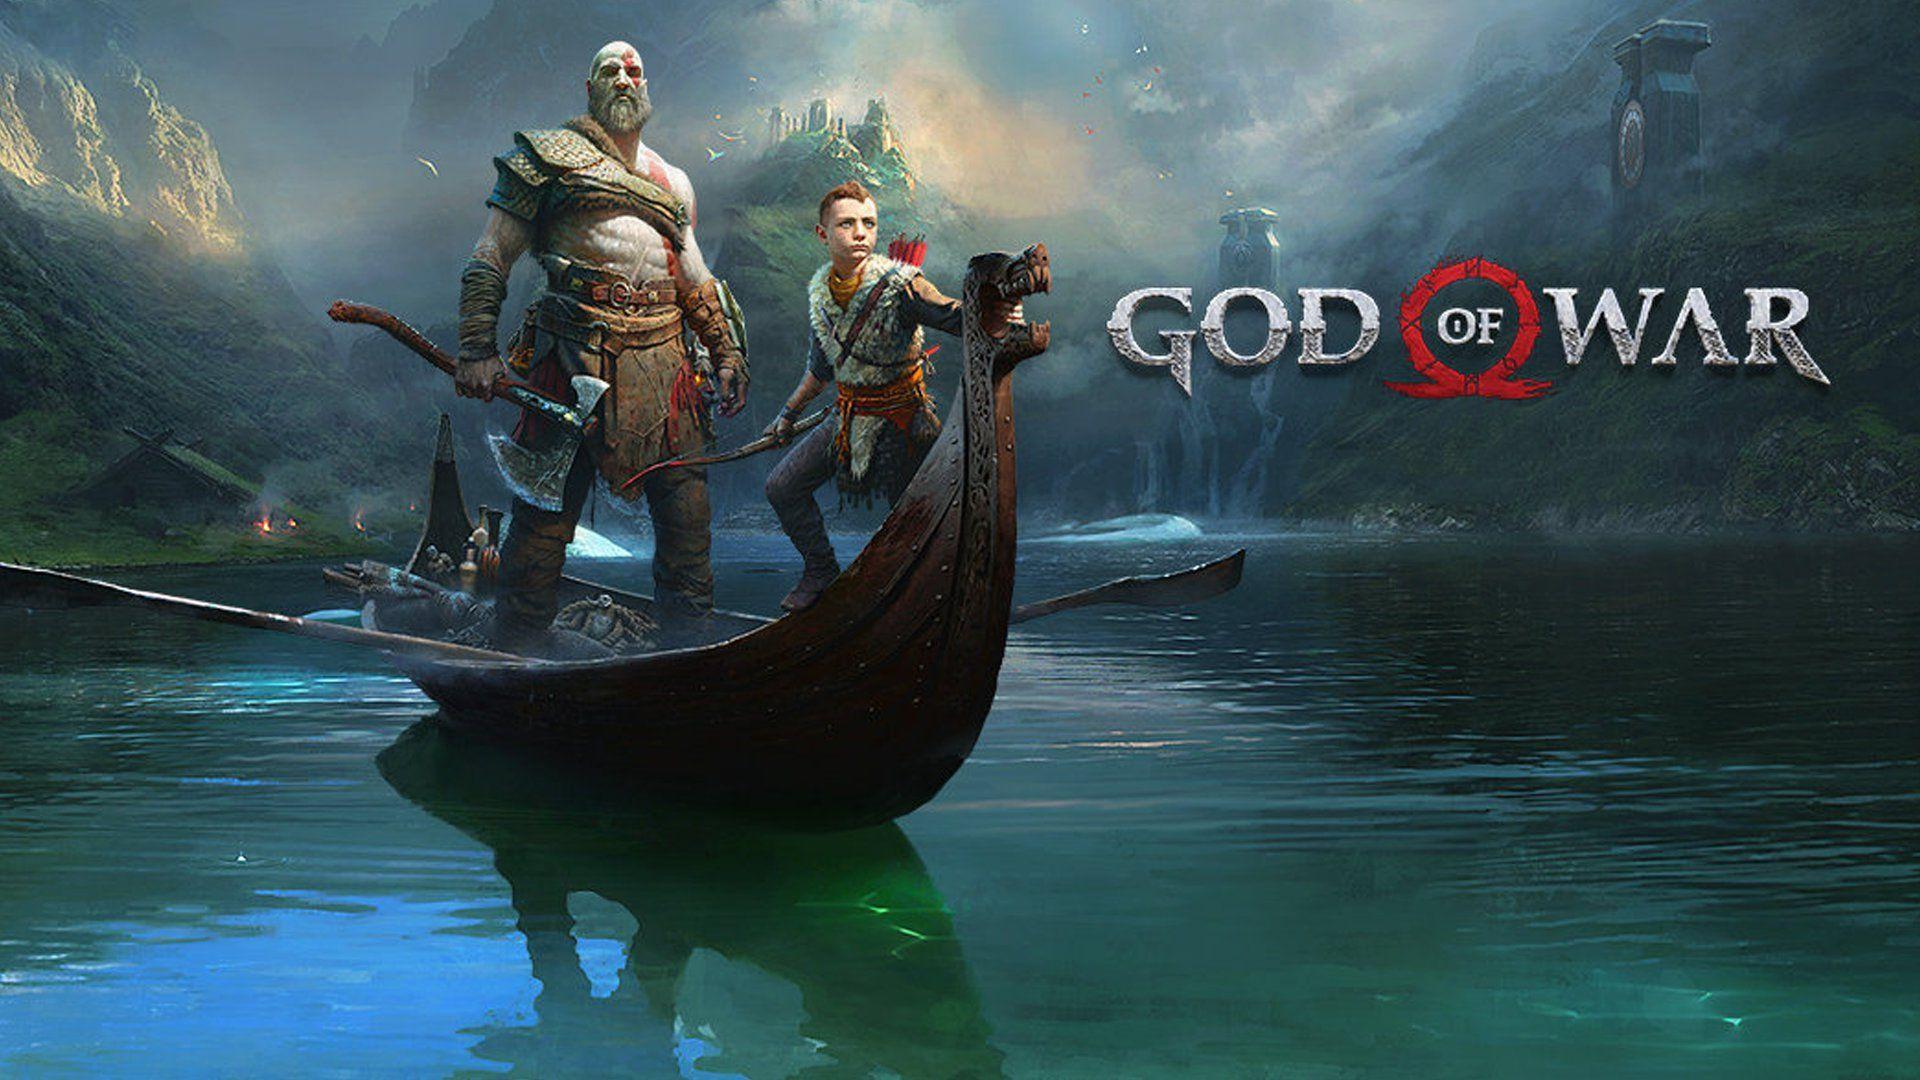 God Of War Ps4 Wallpaper Full Hd Papeis De Parede De Jogos Planos De Fundo Jogos